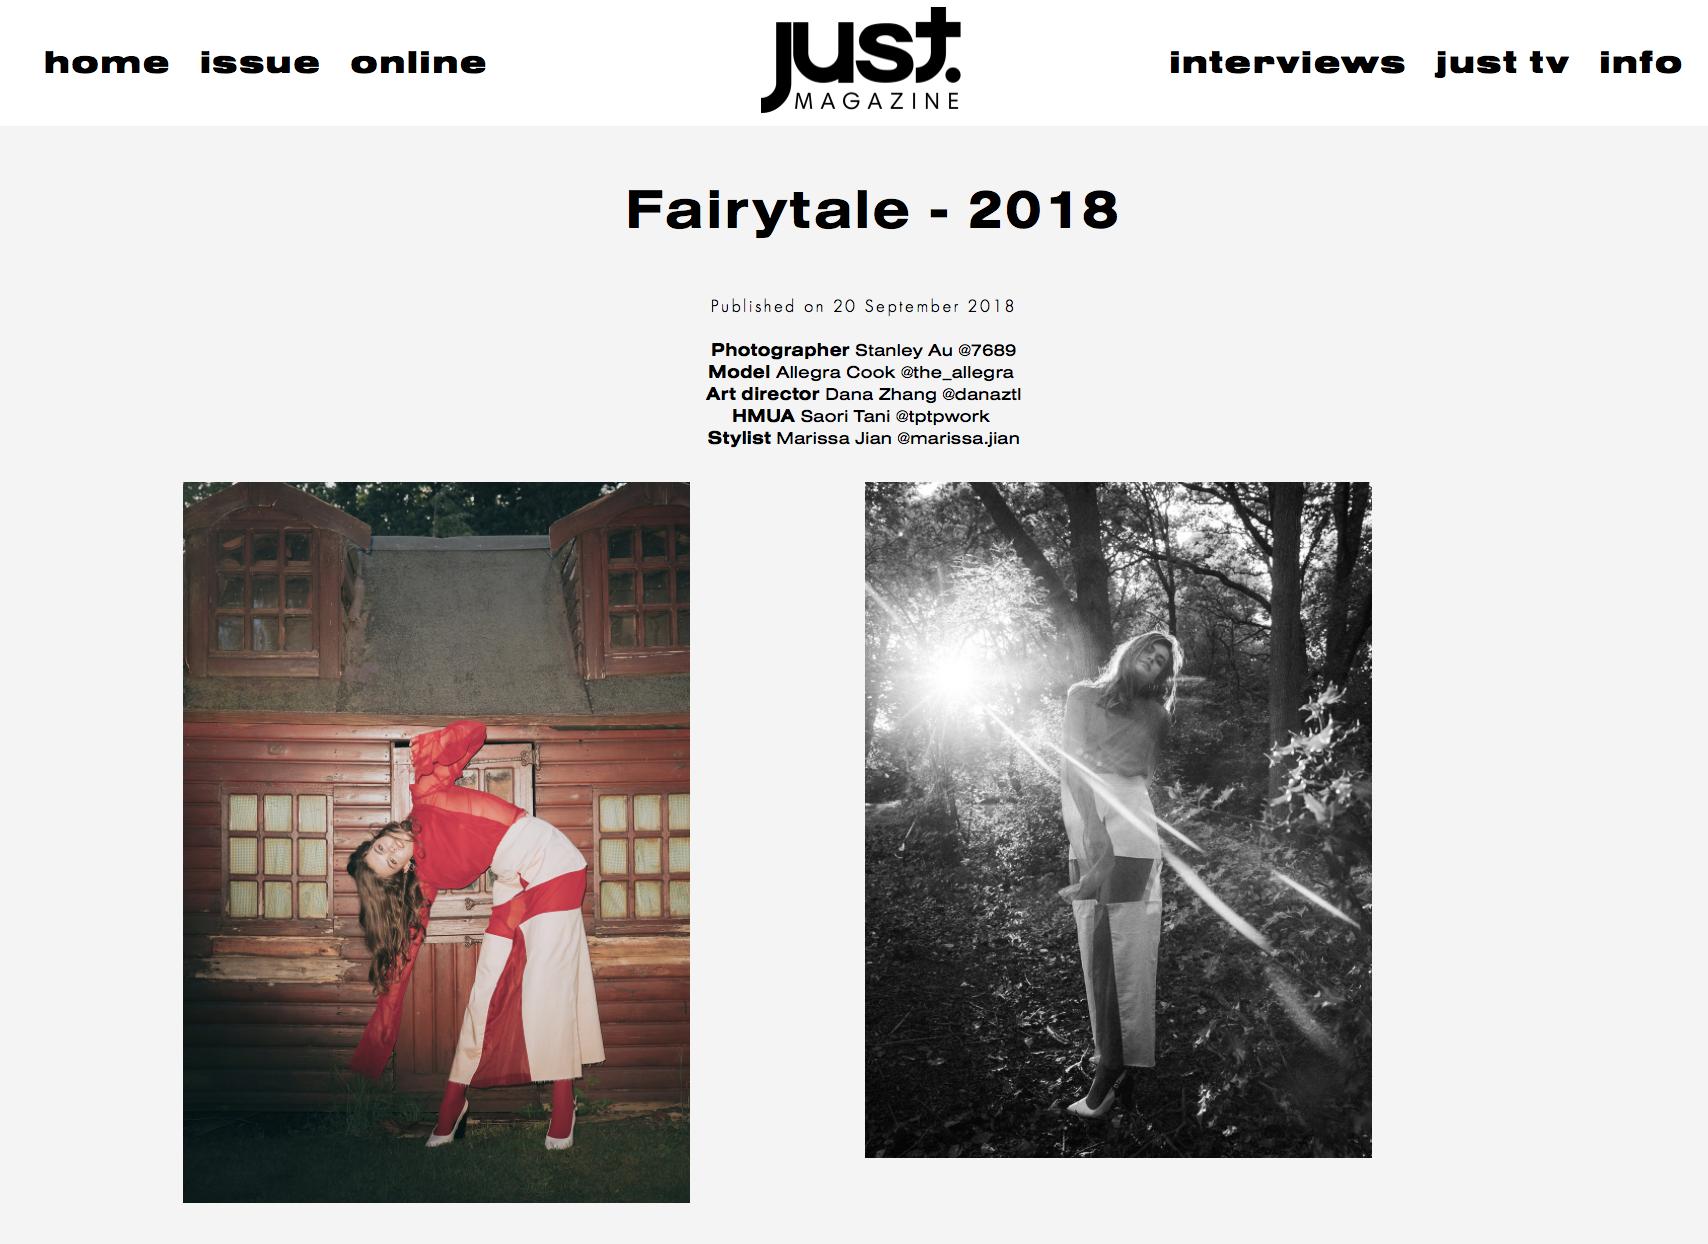 JUST Magazine